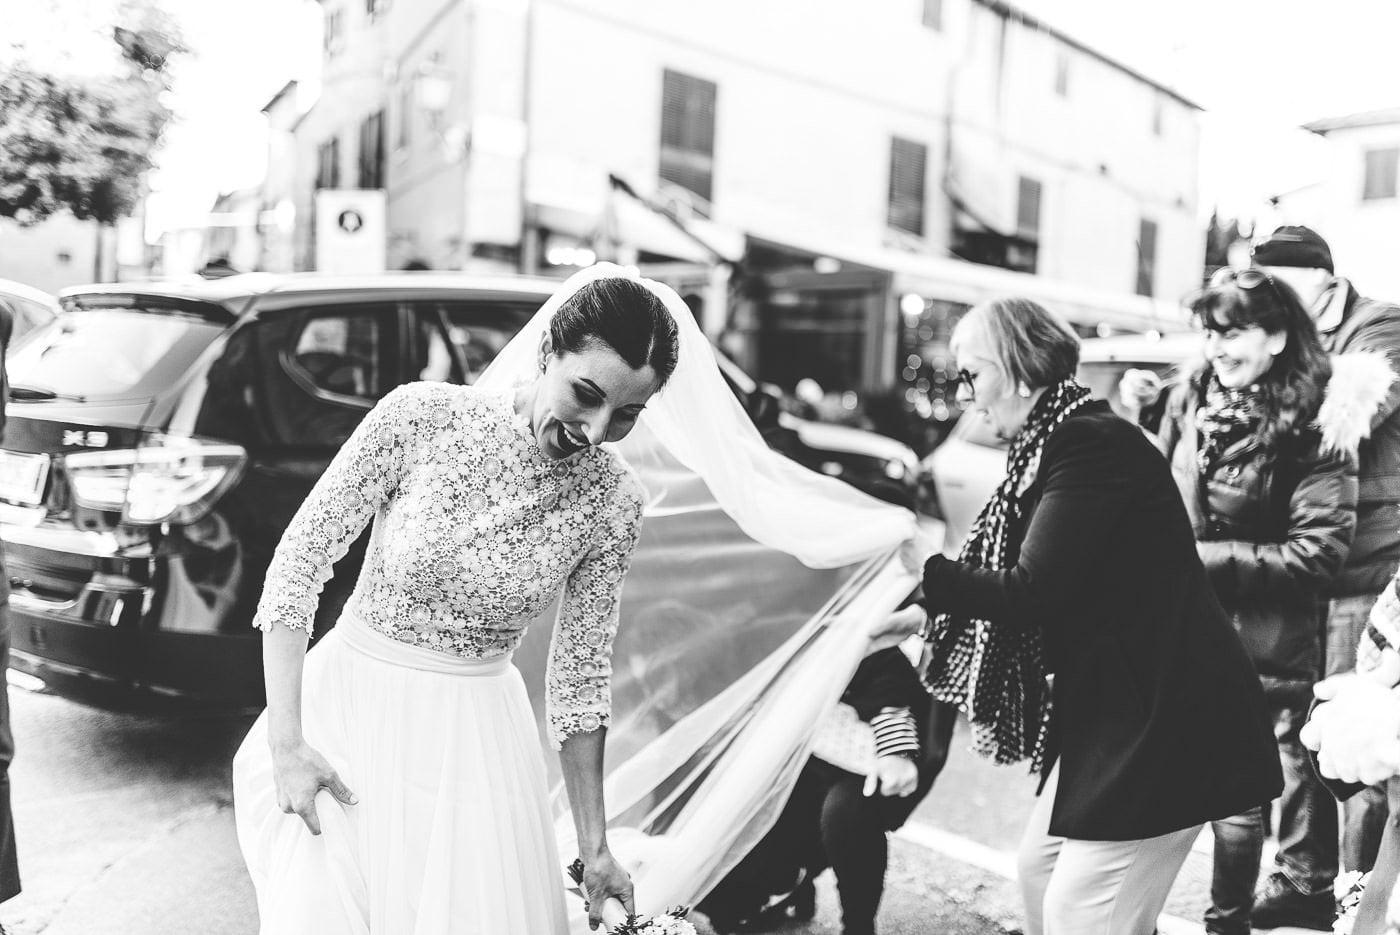 Matrimonio Giulia & Alessandro 28_12 – Alessio Nobili Photographer-16